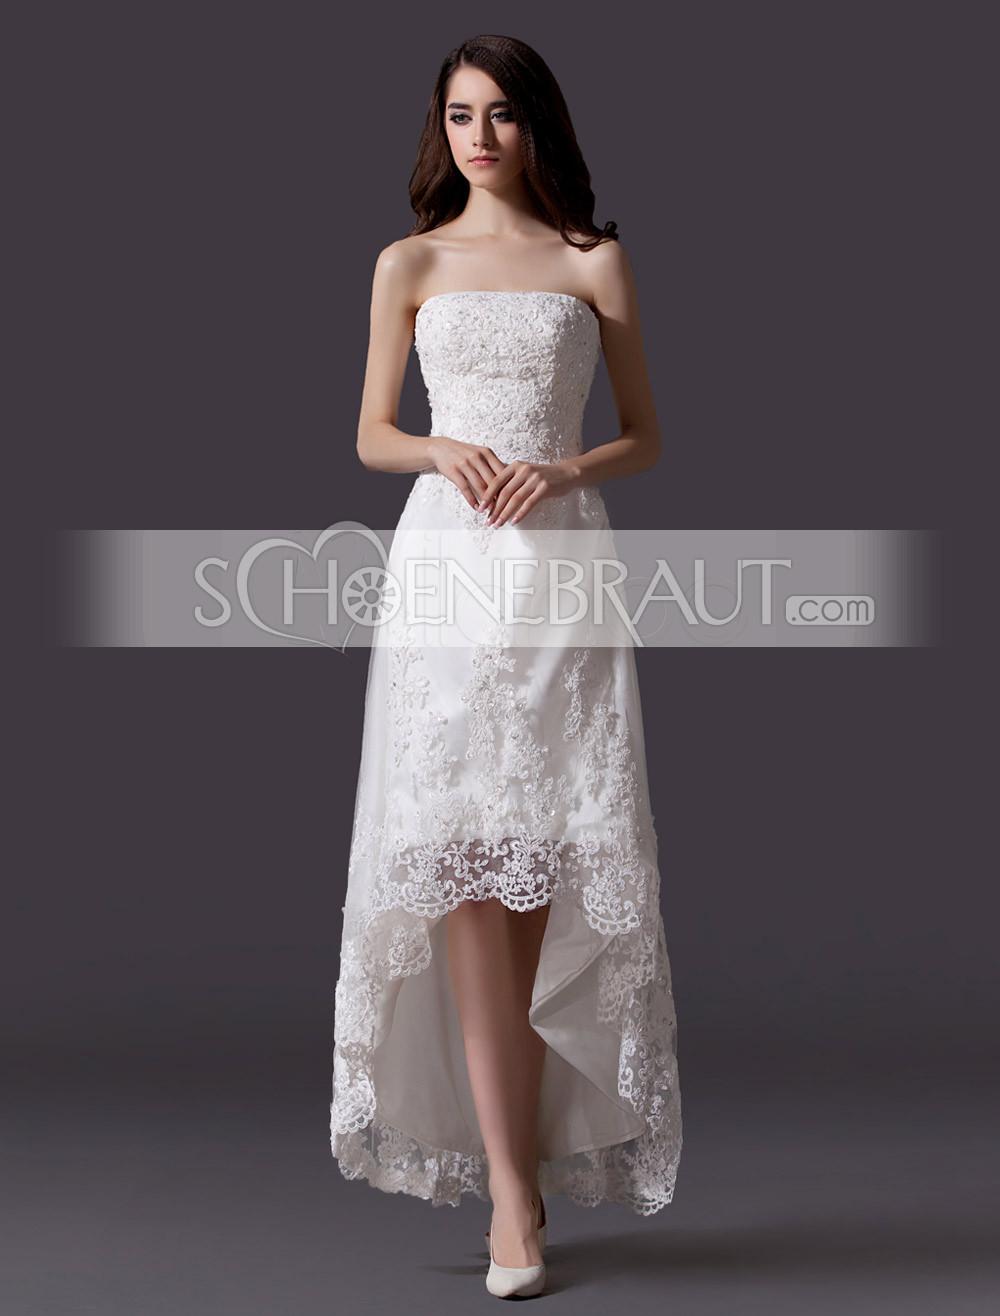 Vokuhila Hochzeitskleid  Standesamtkleider Hochzeitskleider standesamt spitze